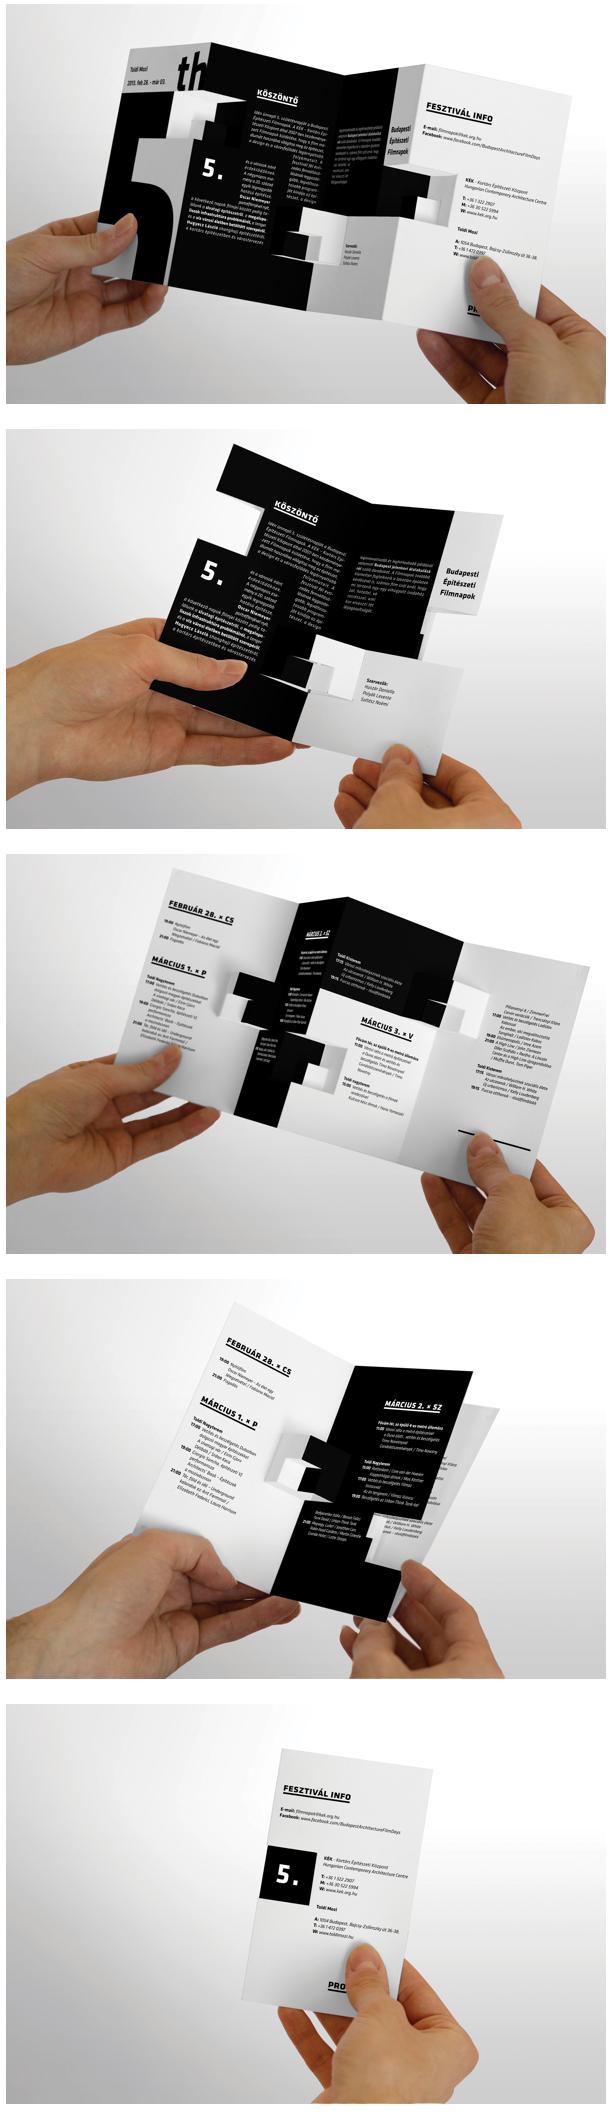 pinterestcomfra411 brochure budapest architecture film festival brochure